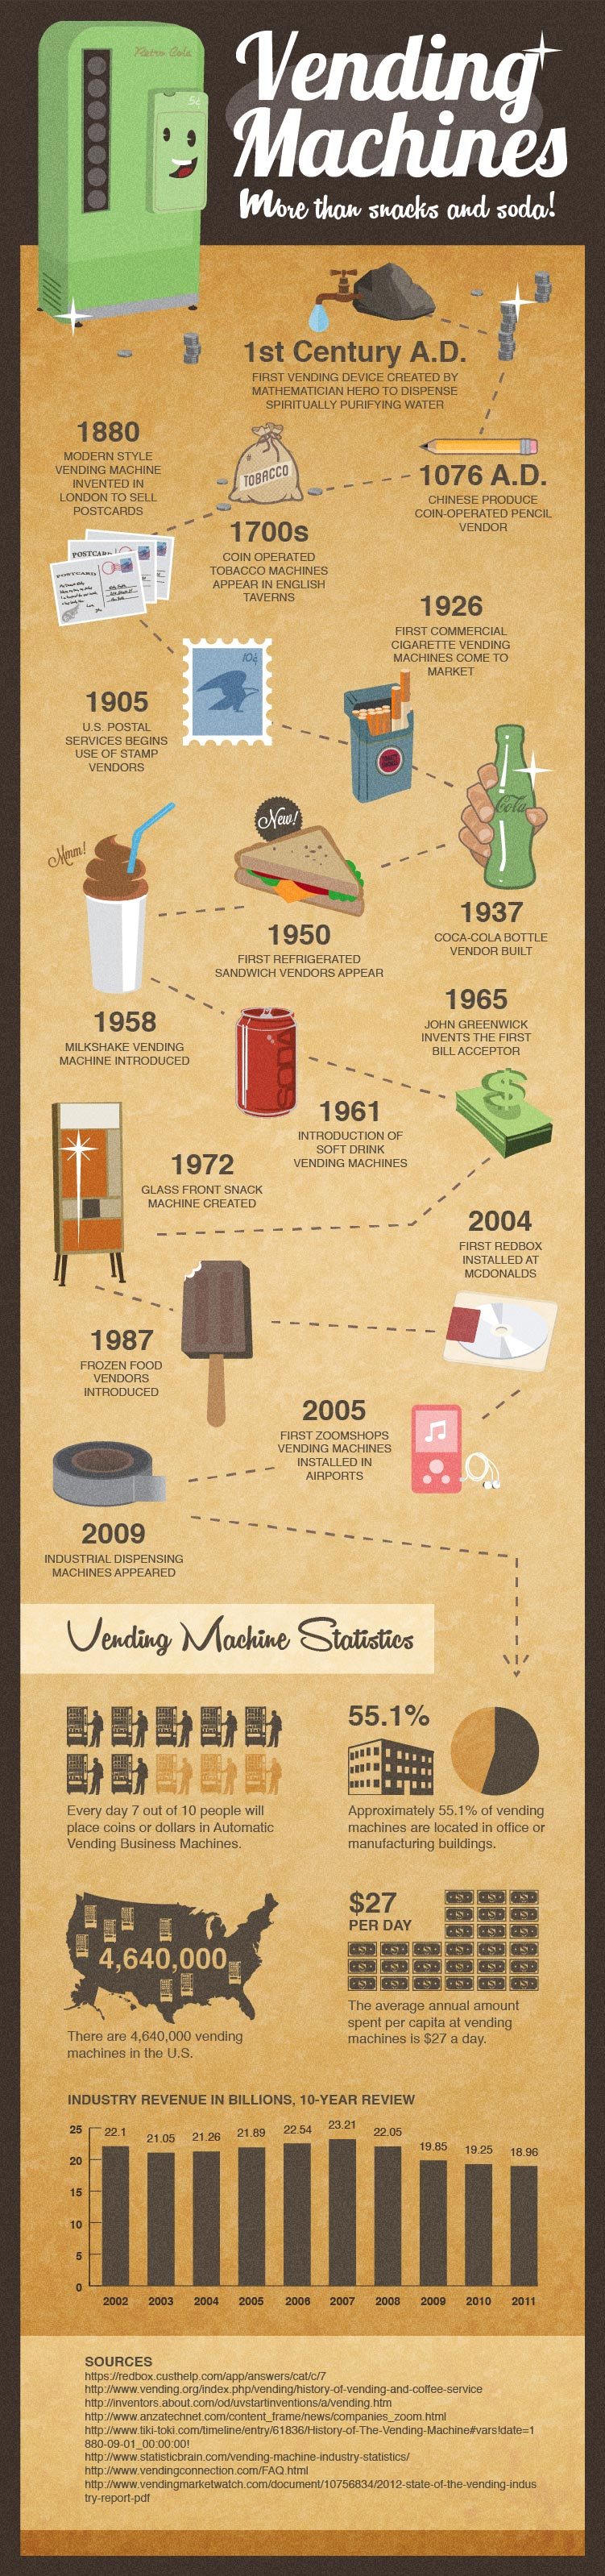 Vending Machines History